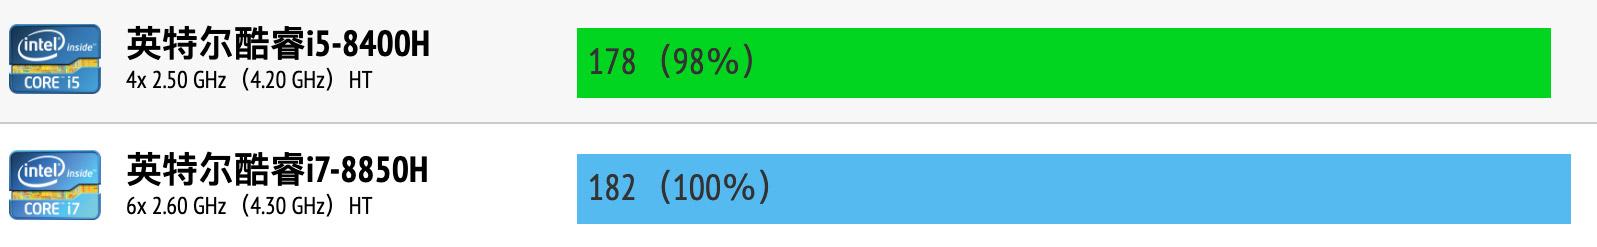 Intel Core i5-8400H和i7-8850H性能跑分对比评测